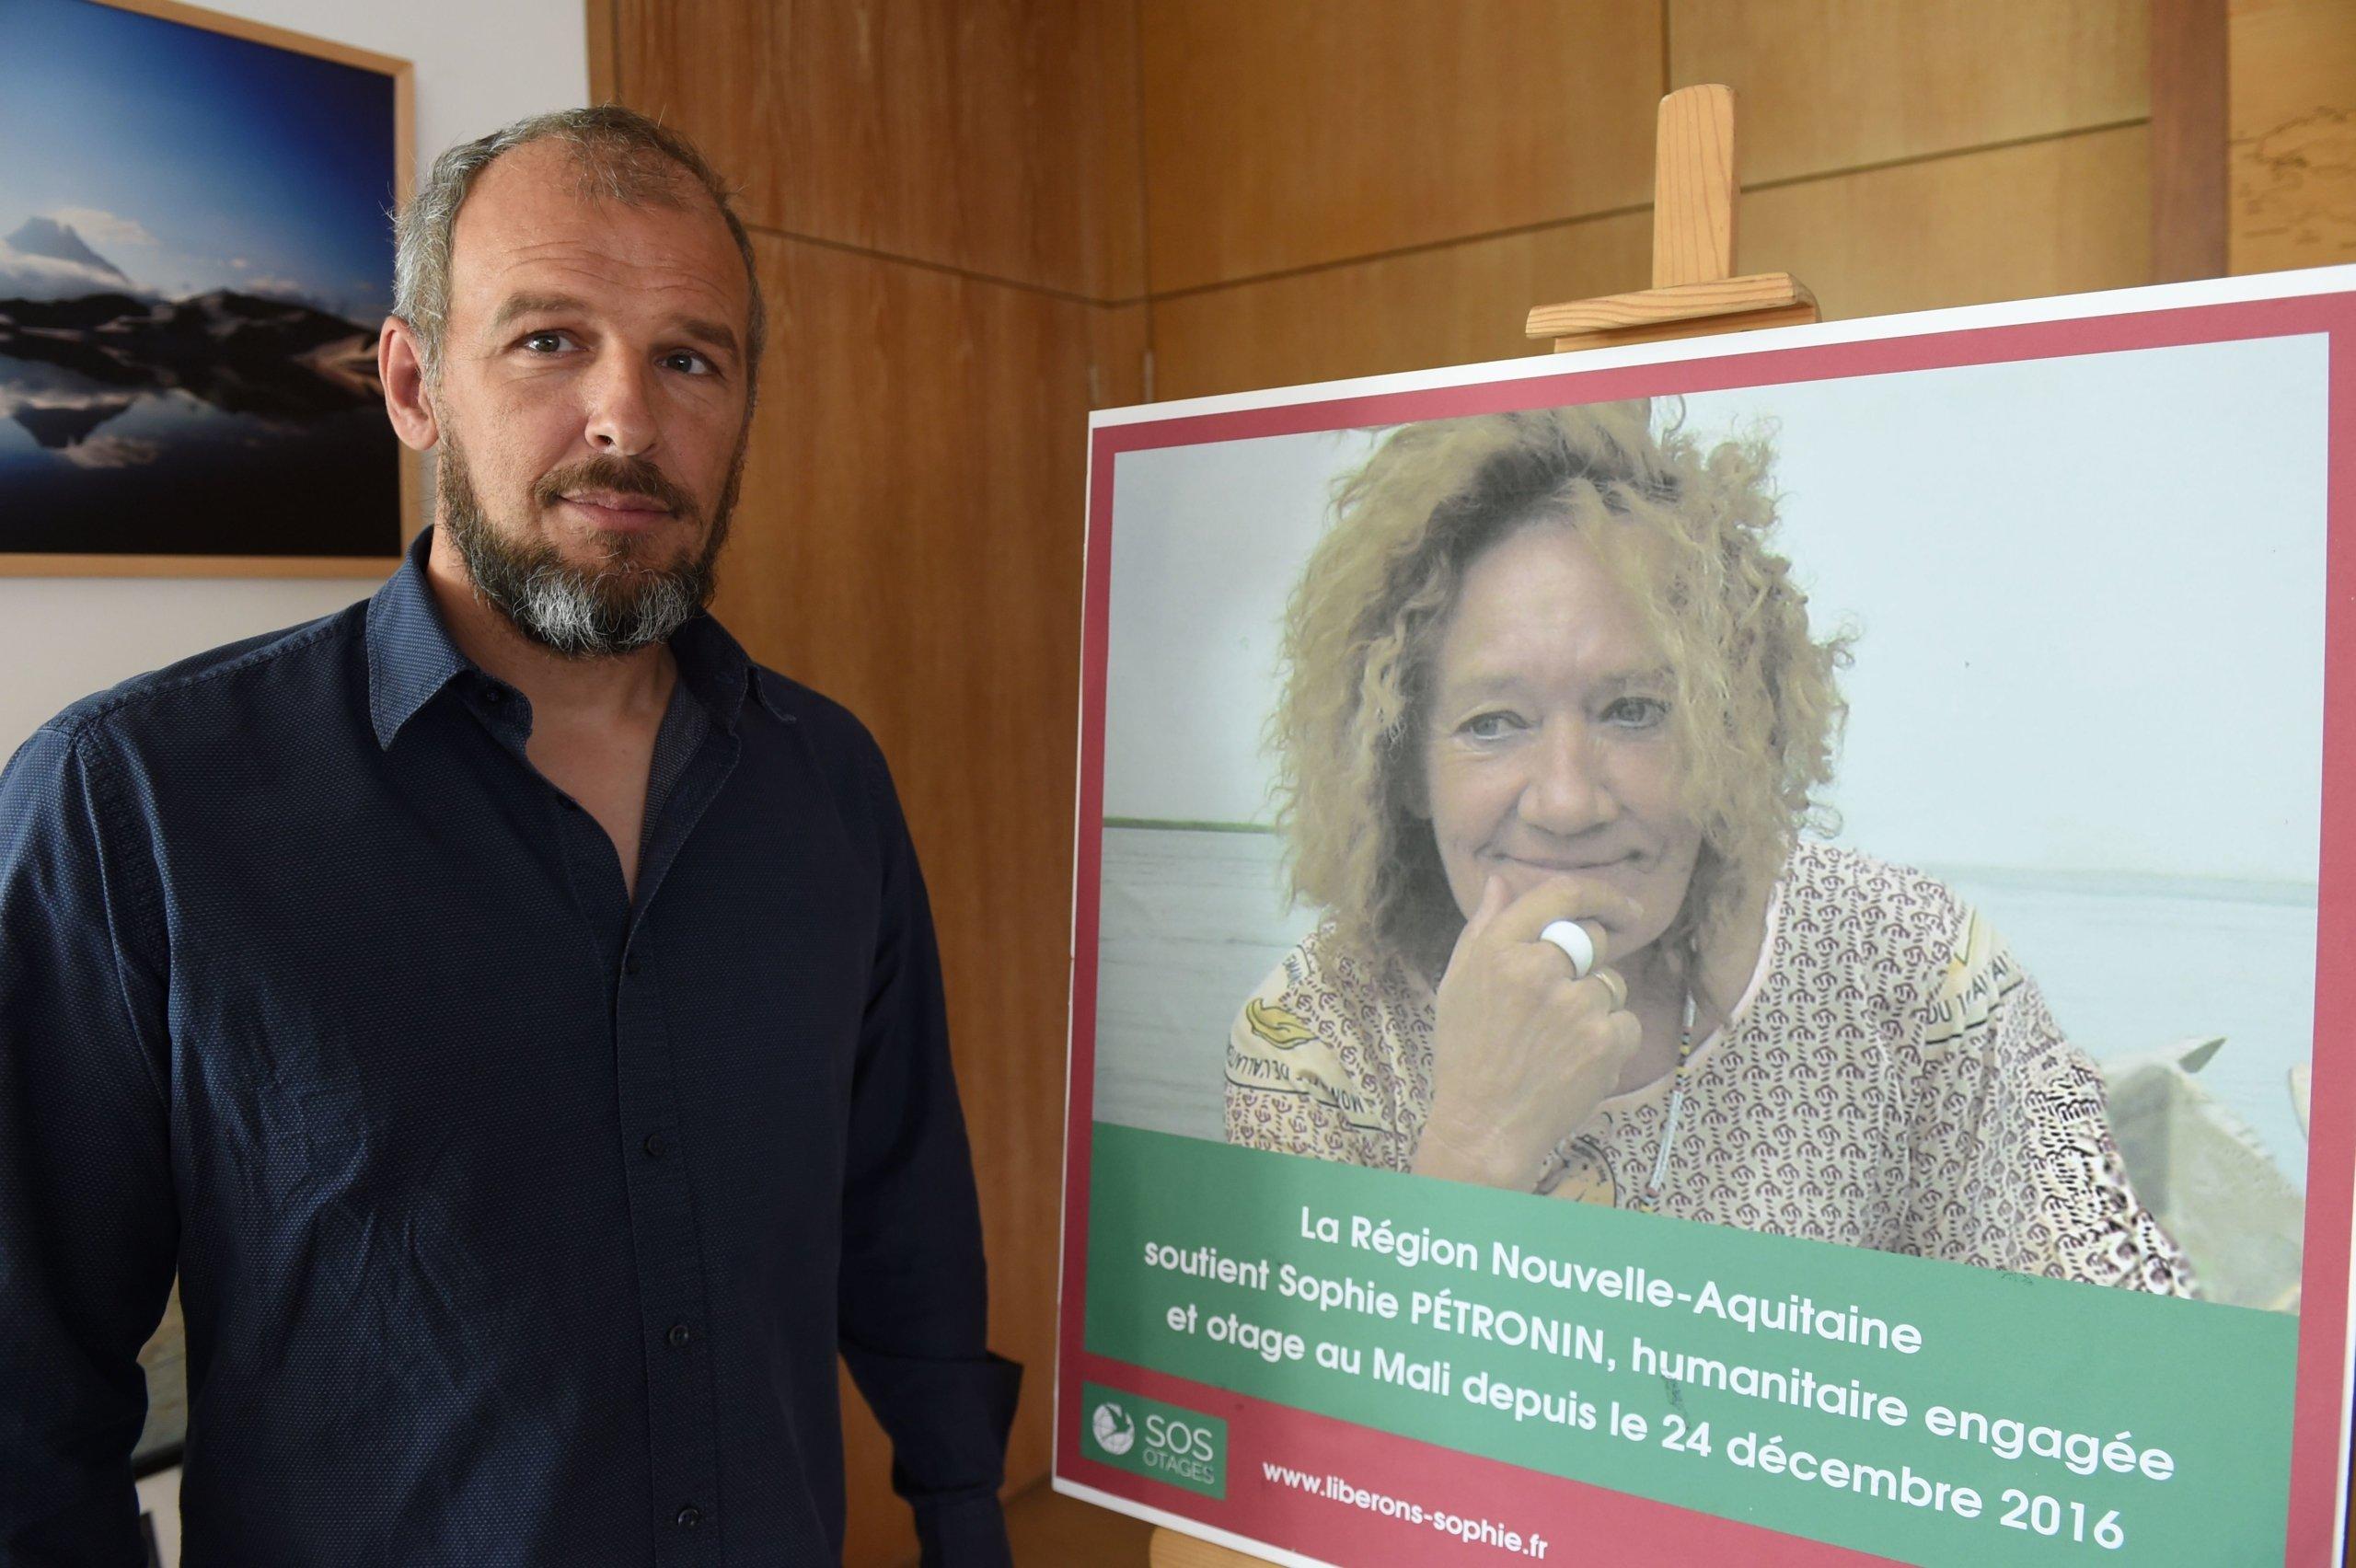 FRANCE-MALI-POLITICS-UNREST